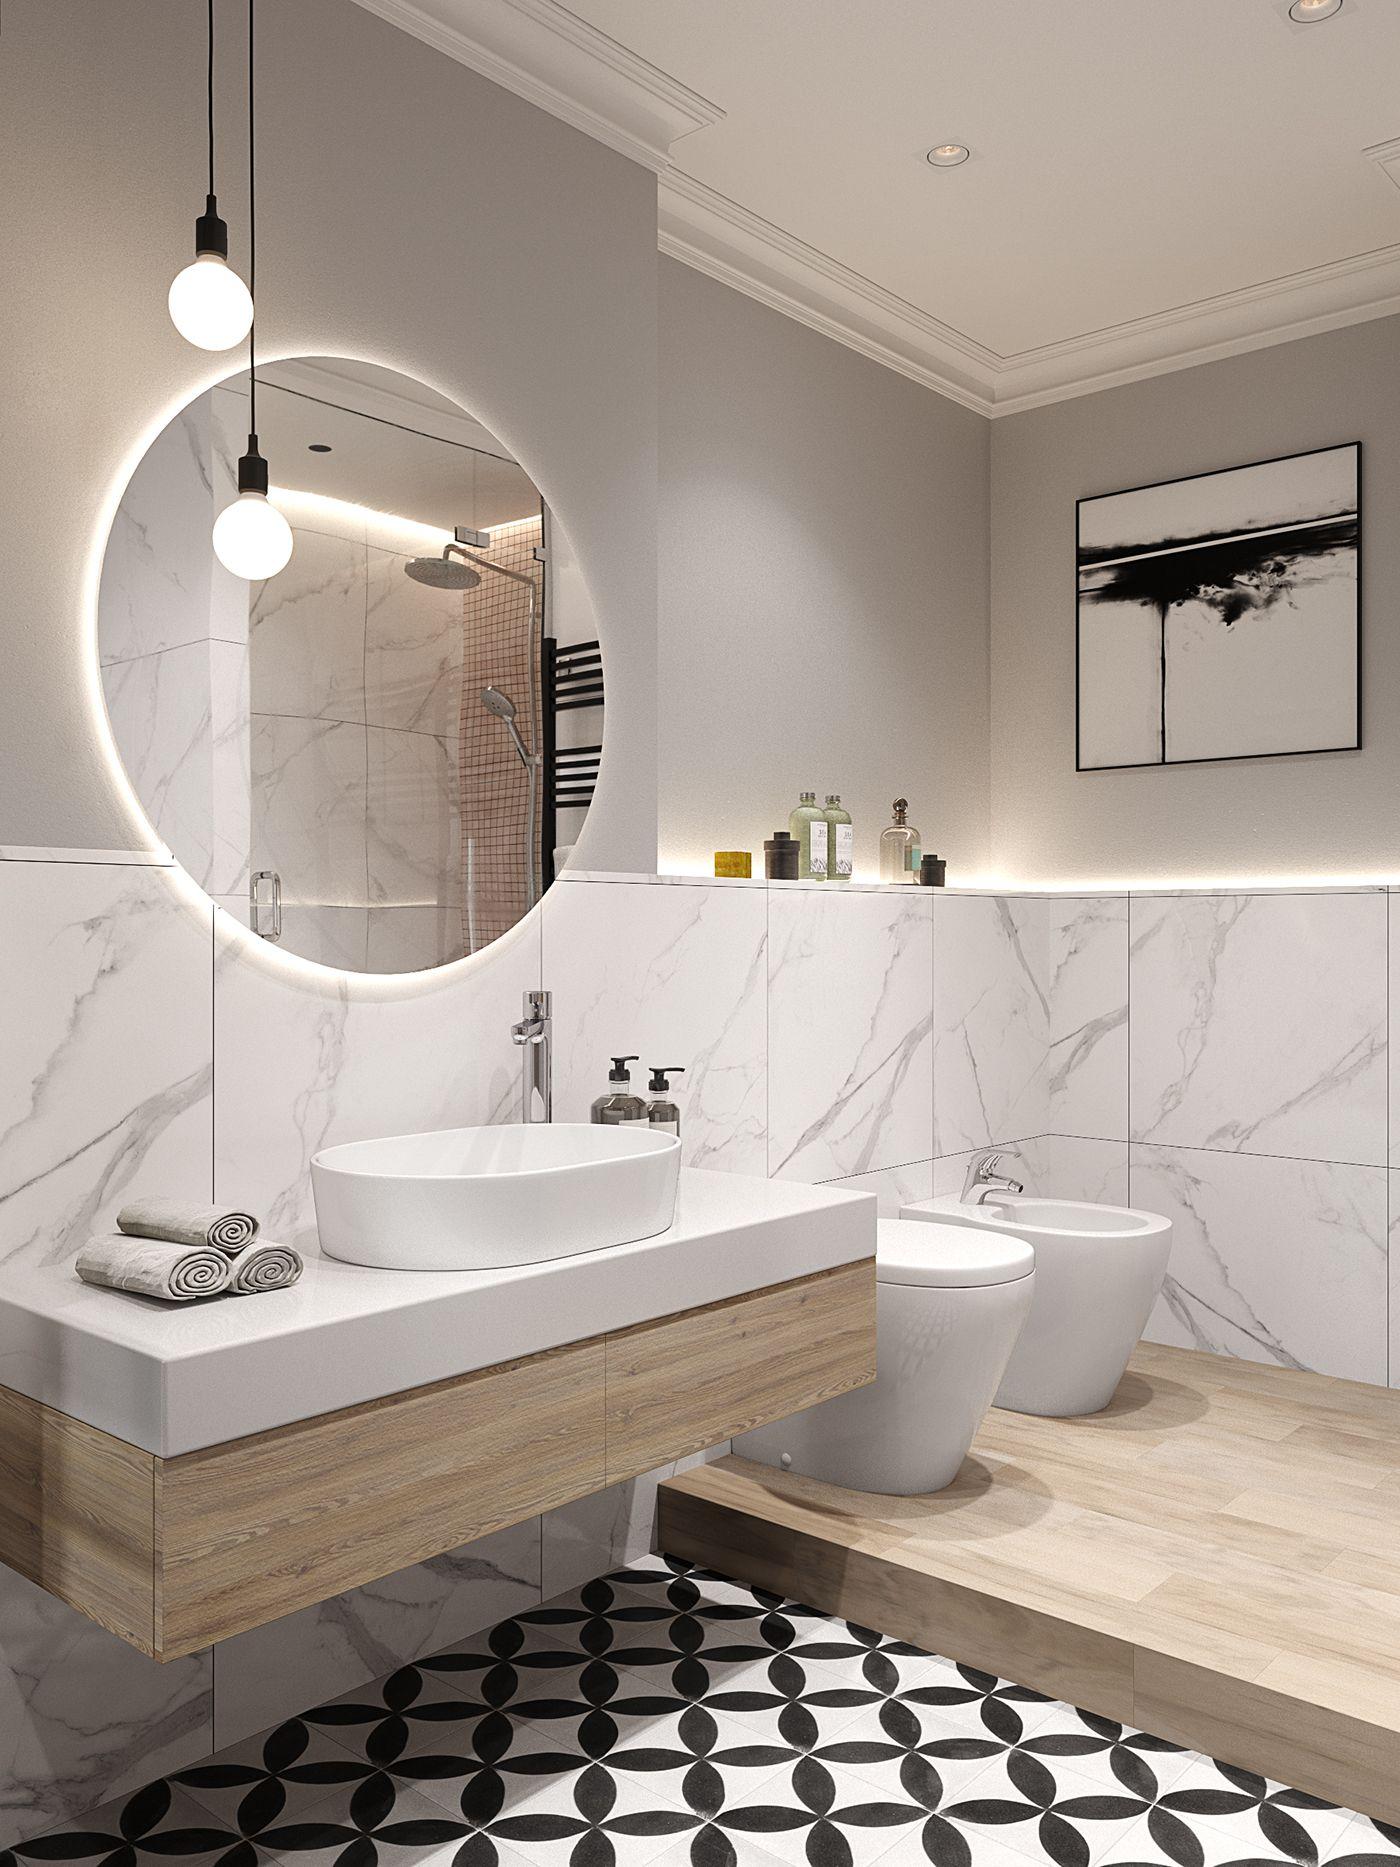 630 Bathroom Lighting Inspiration Ideas, Cool Bathroom Lights